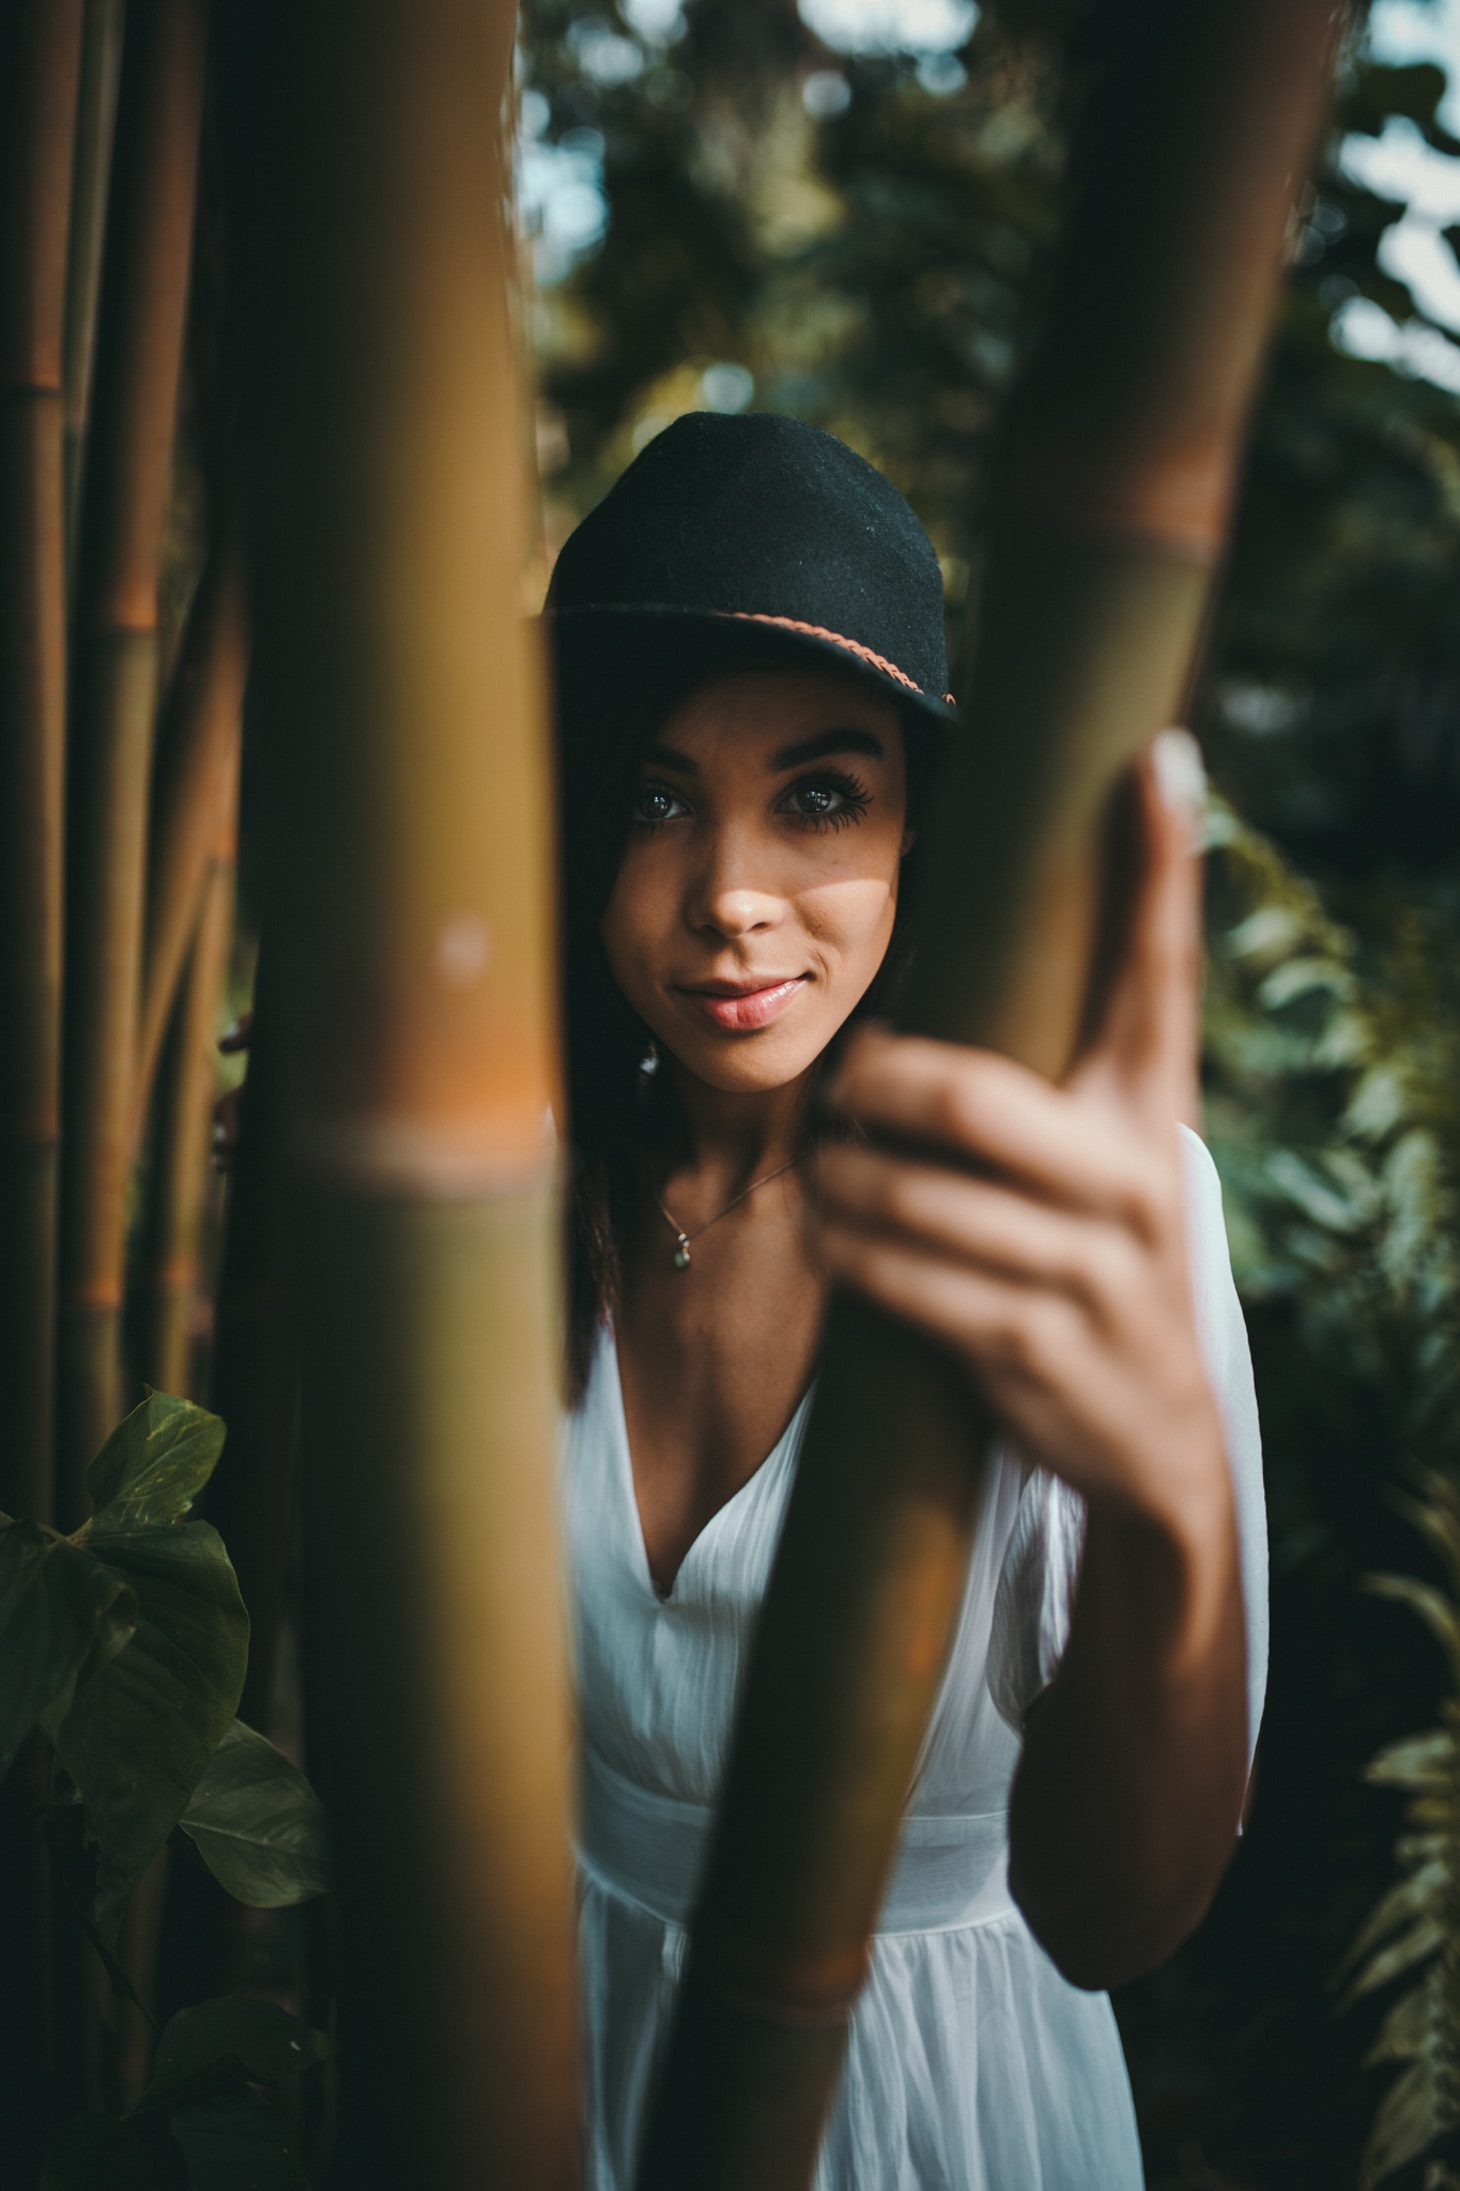 Vrouw staat in tuin